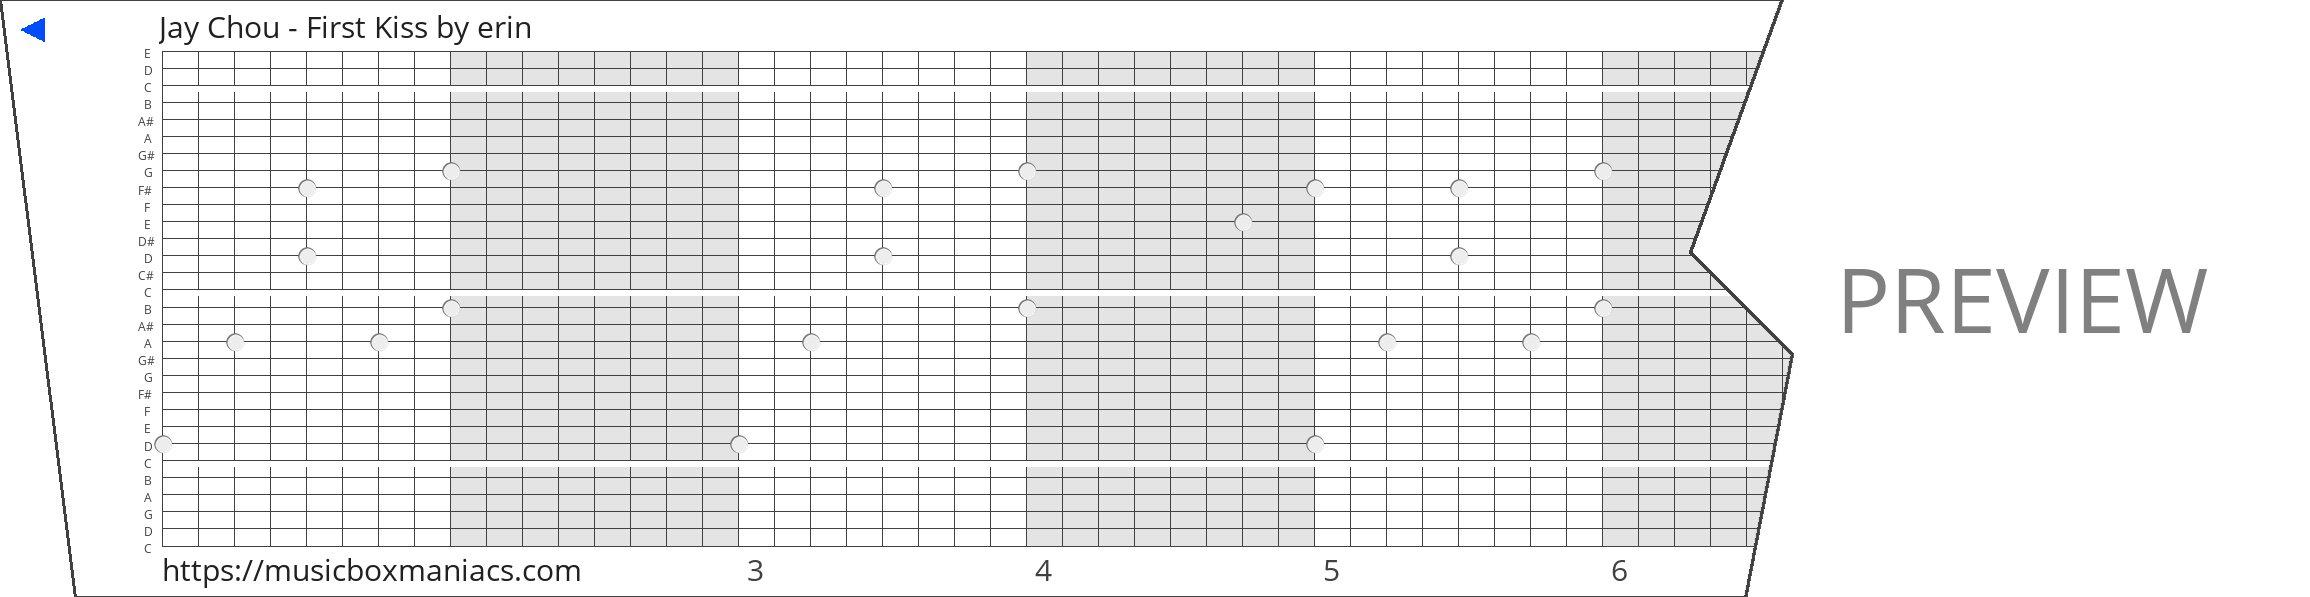 Jay Chou - First Kiss 30 note music box paper strip